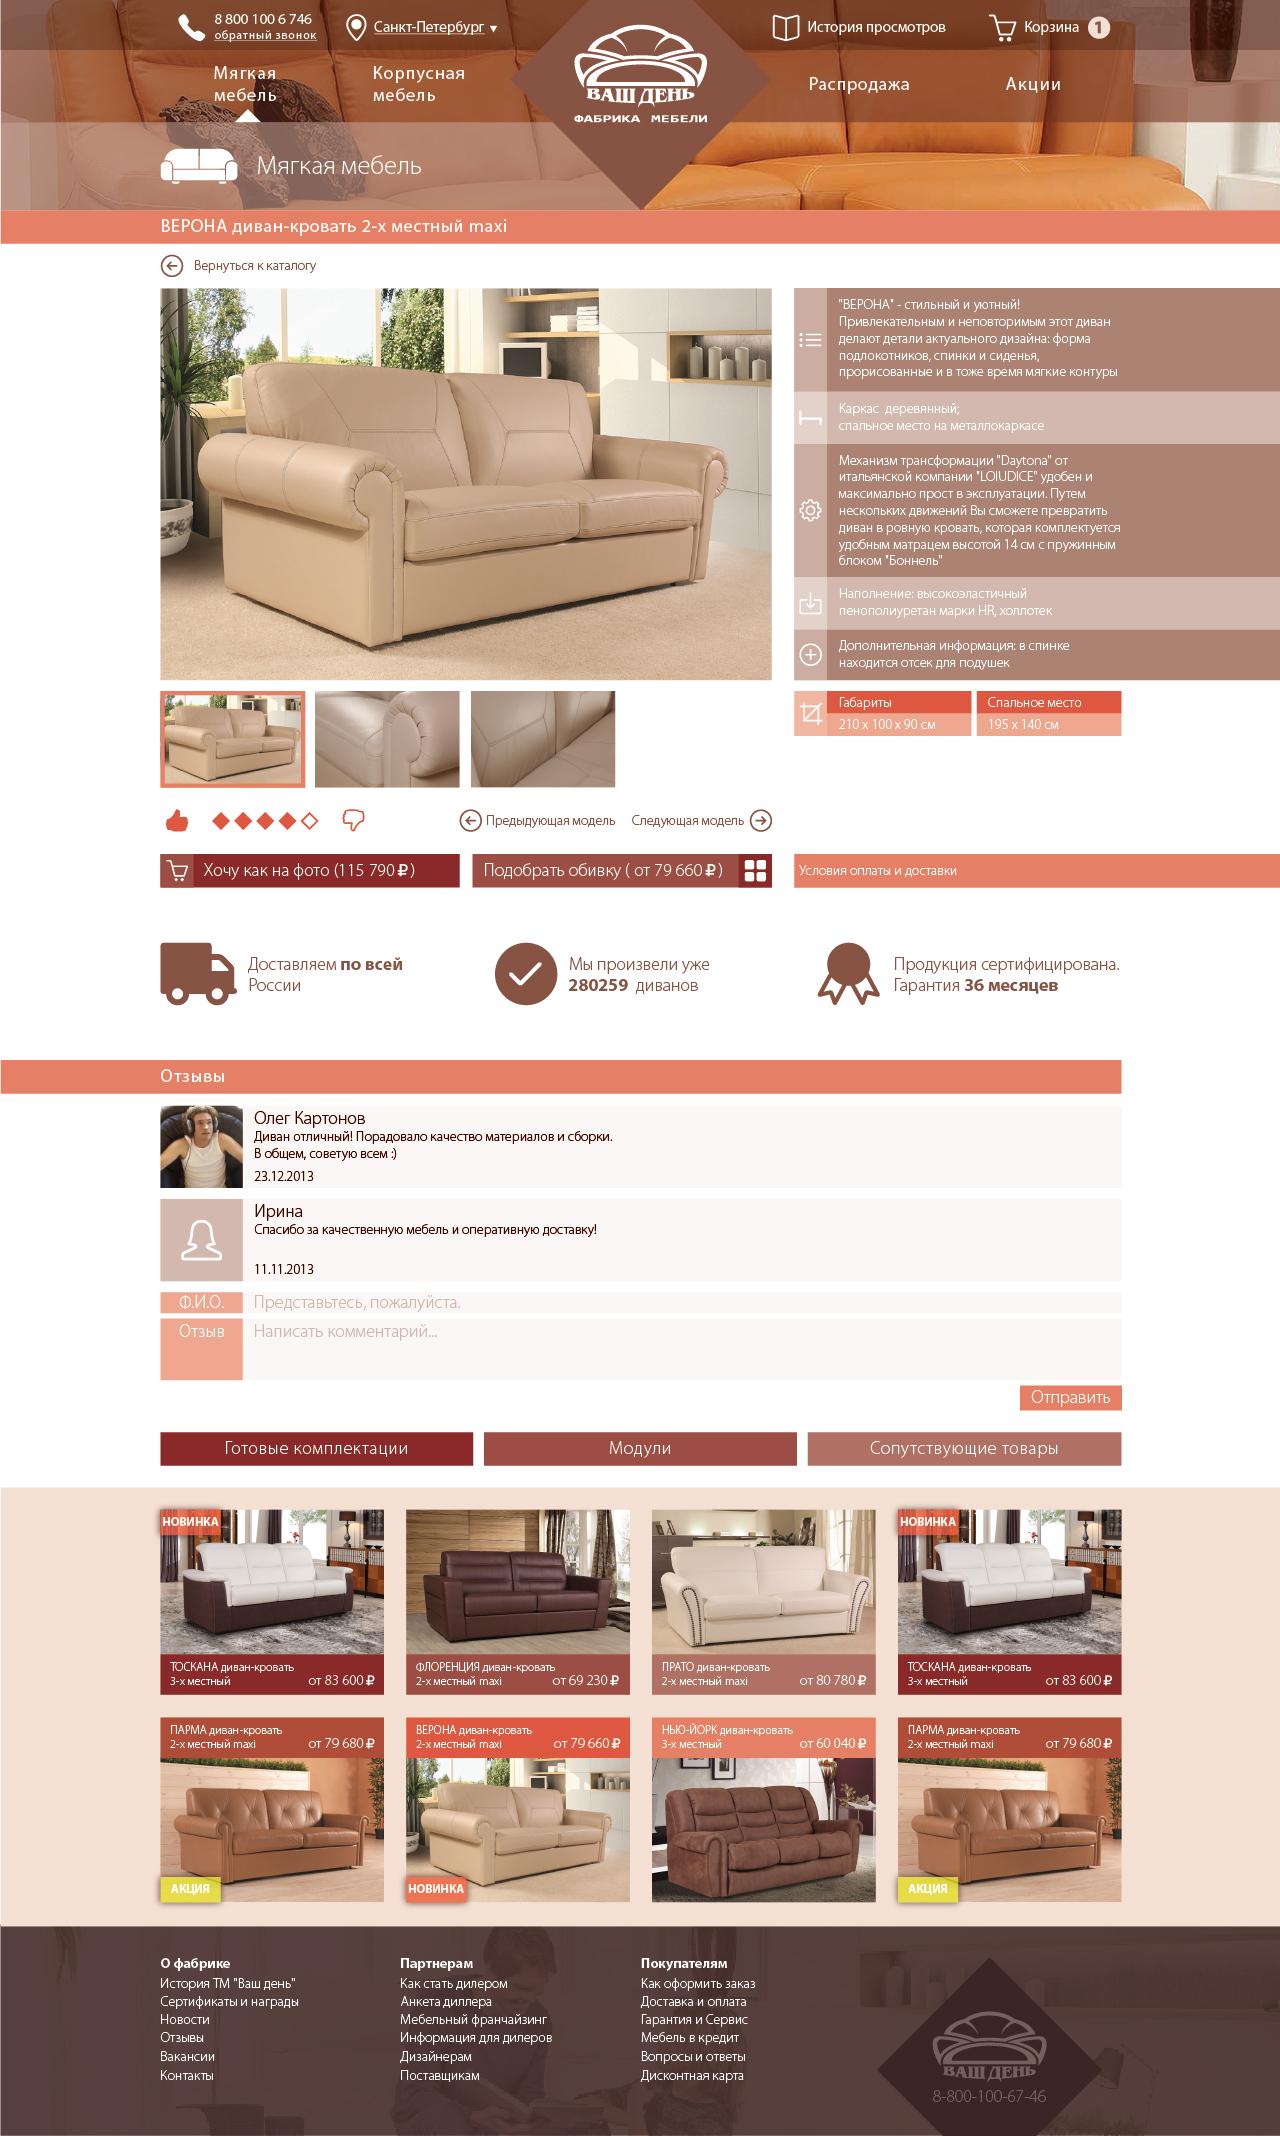 Разработать дизайн для интернет-магазина мебели фото f_91452eea047e554d.jpg